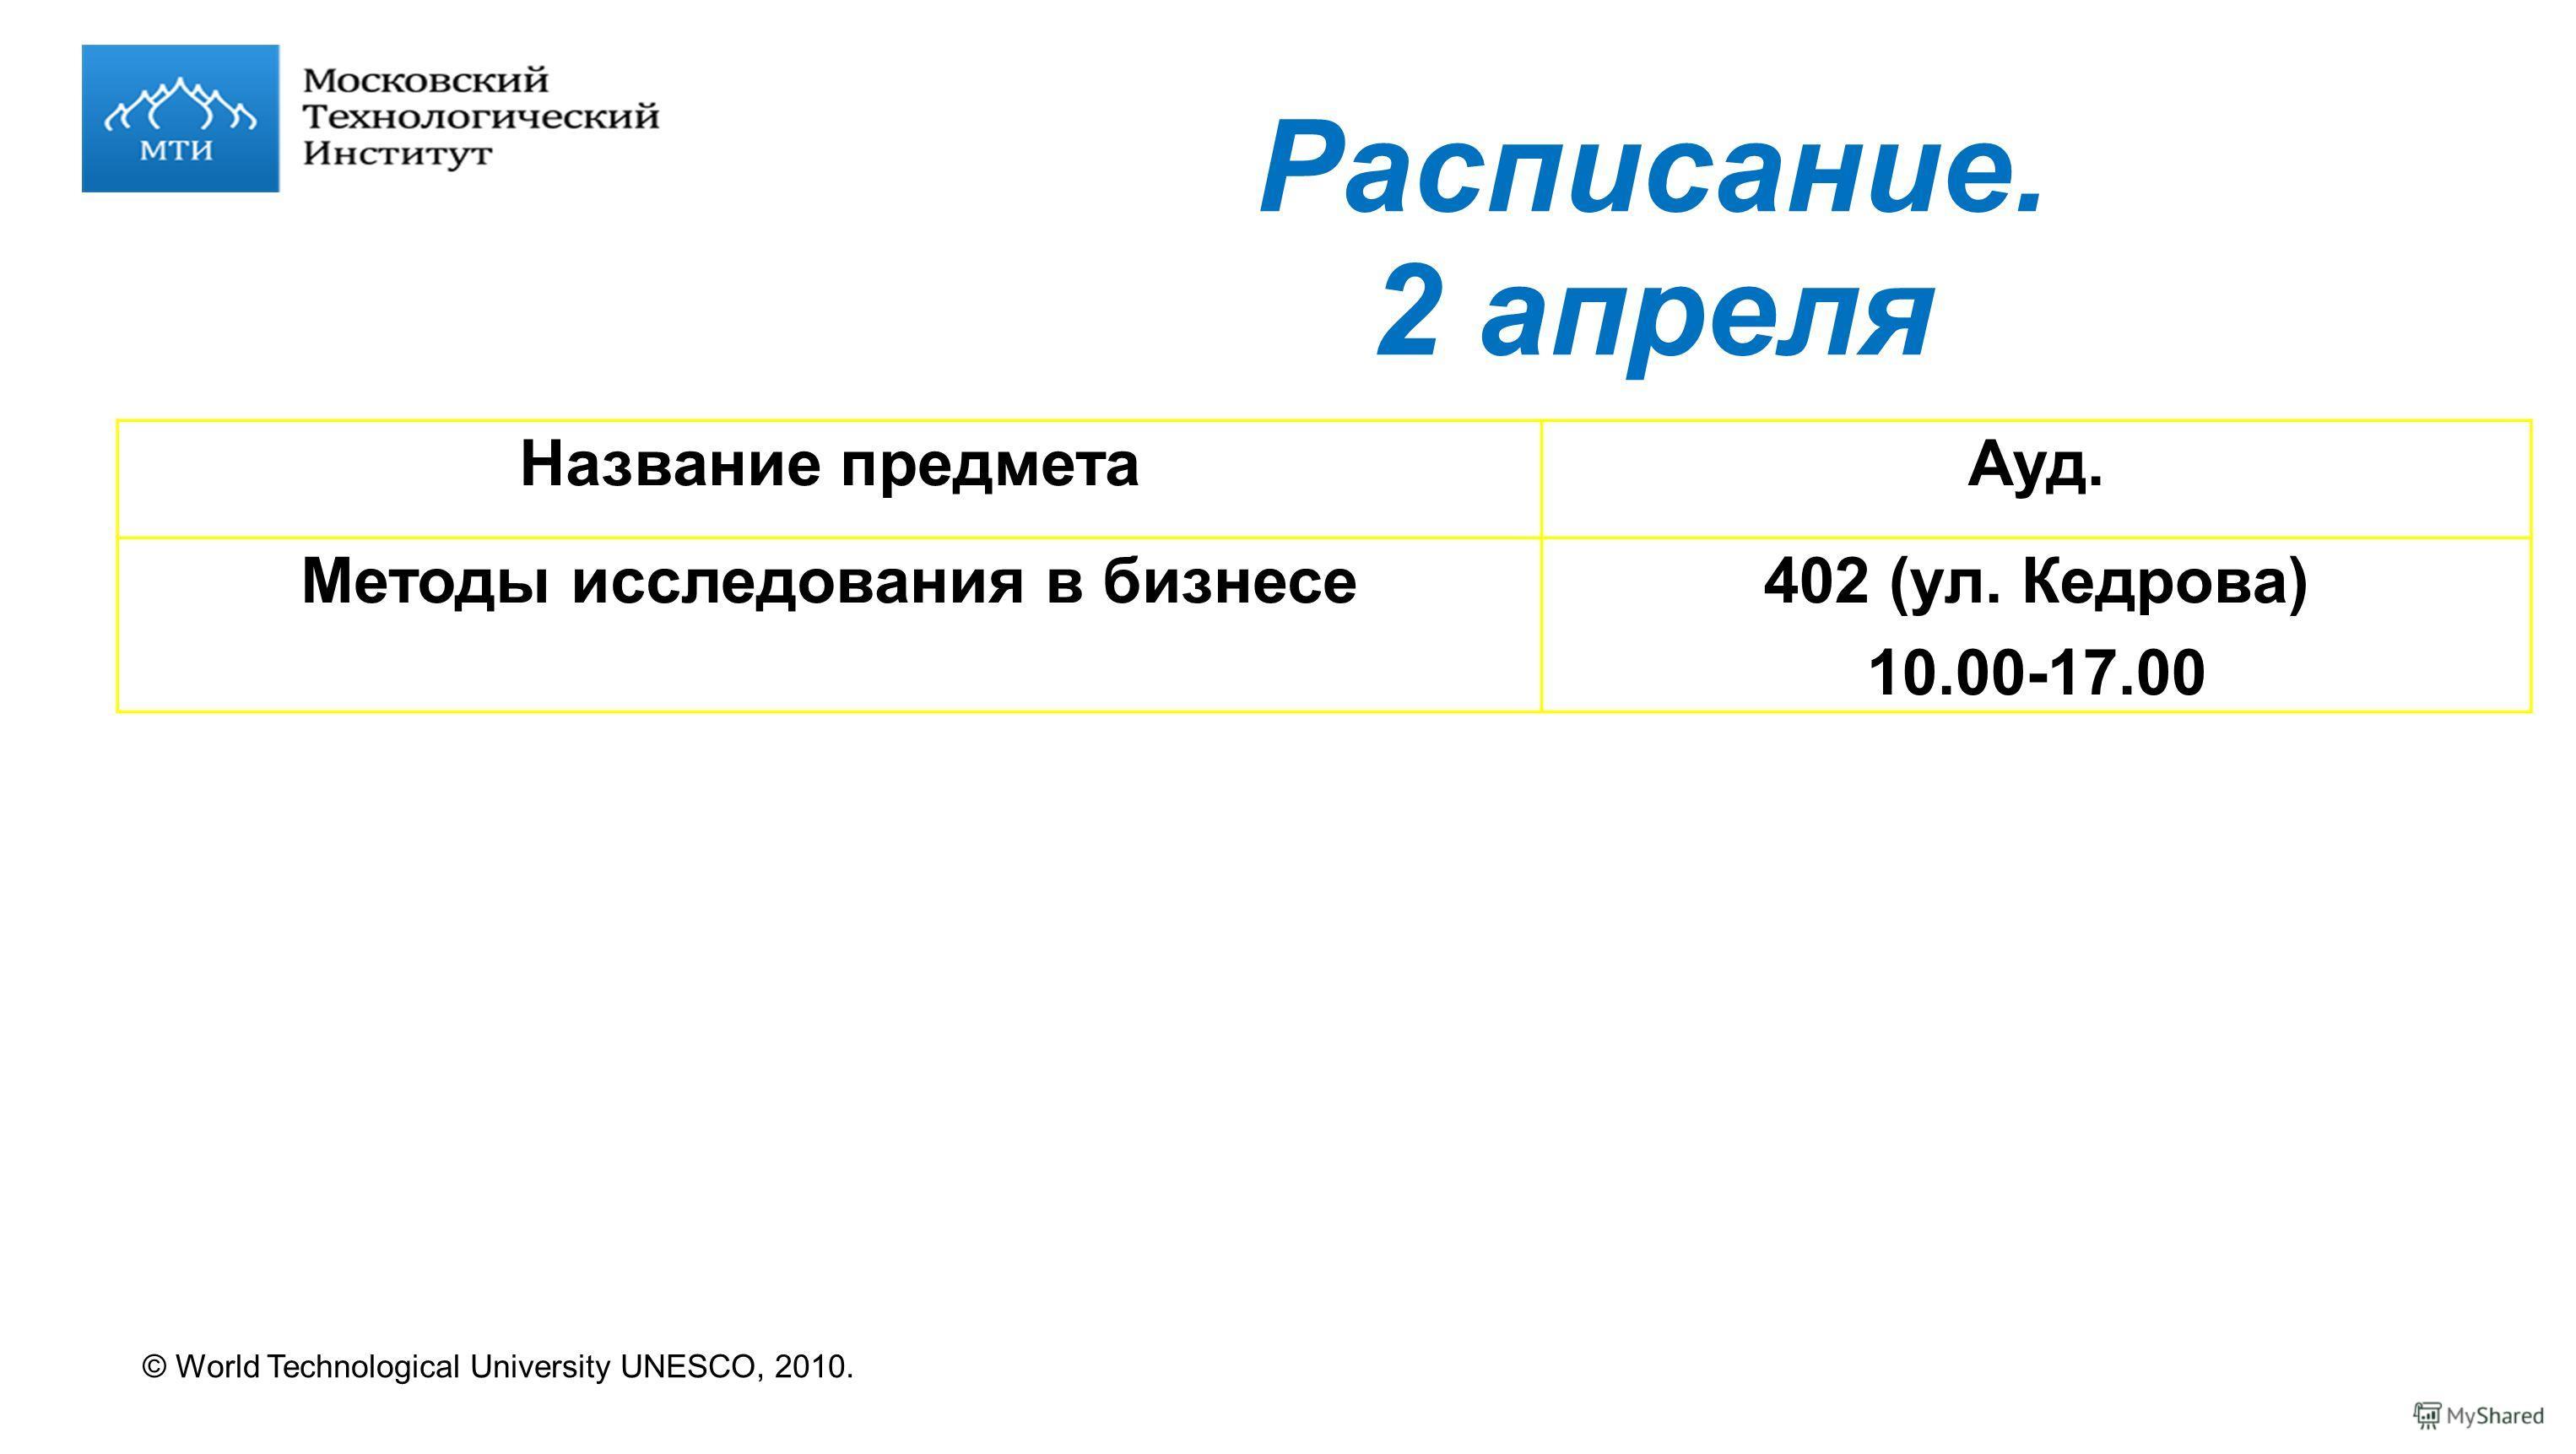 © World Technological University UNESCO, 2010. Расписание. 2 апреля Название предметаАуд. Методы исследования в бизнесе402 (ул. Кедрова) 10.00-17.00